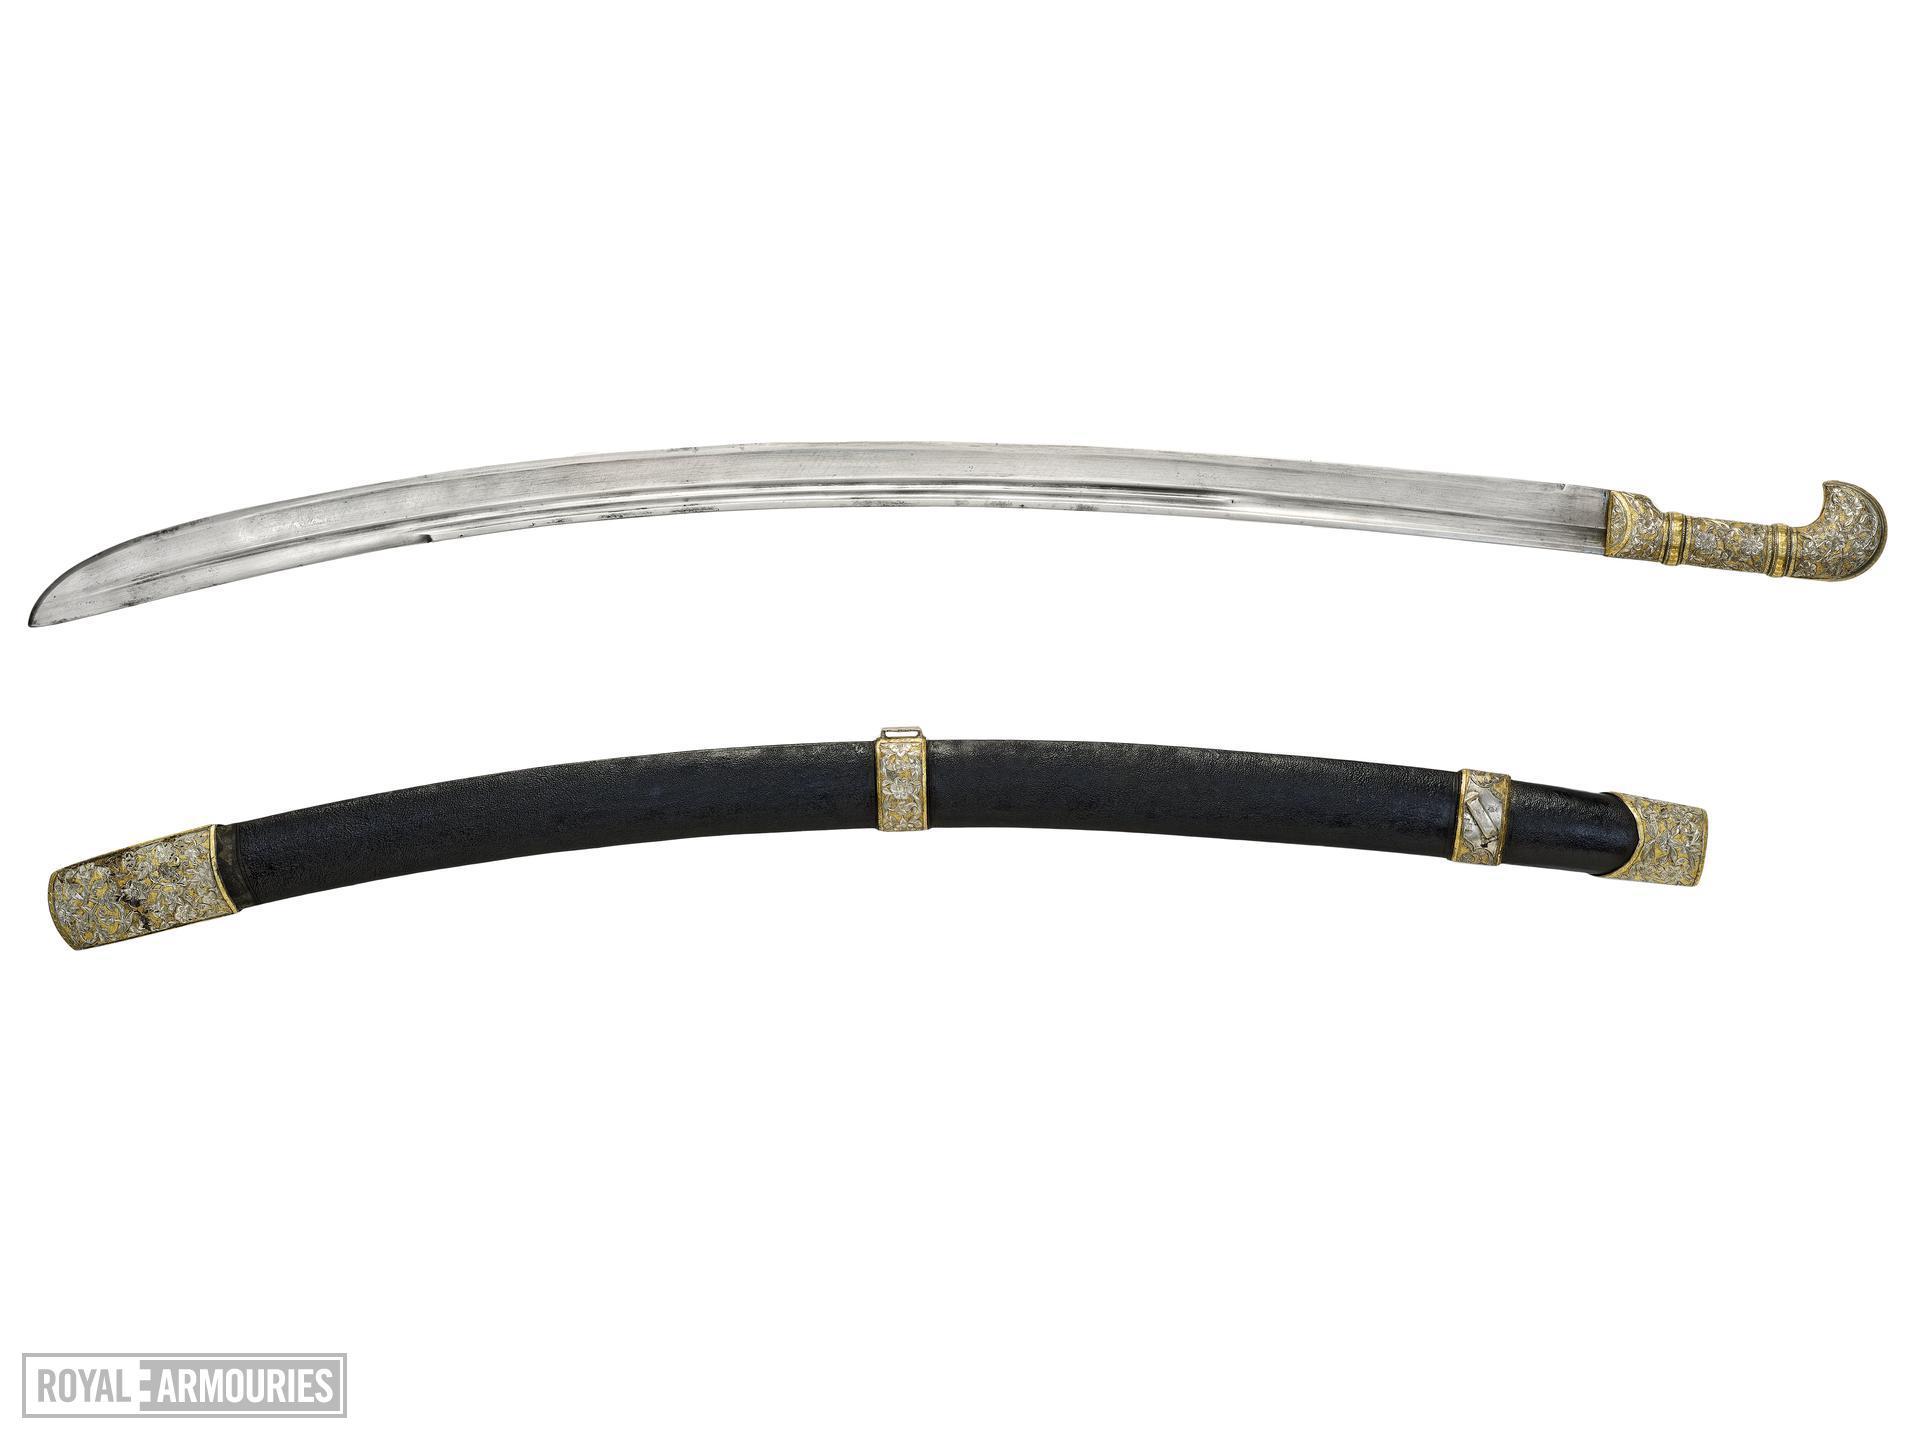 Sword (shashka) and scabbard